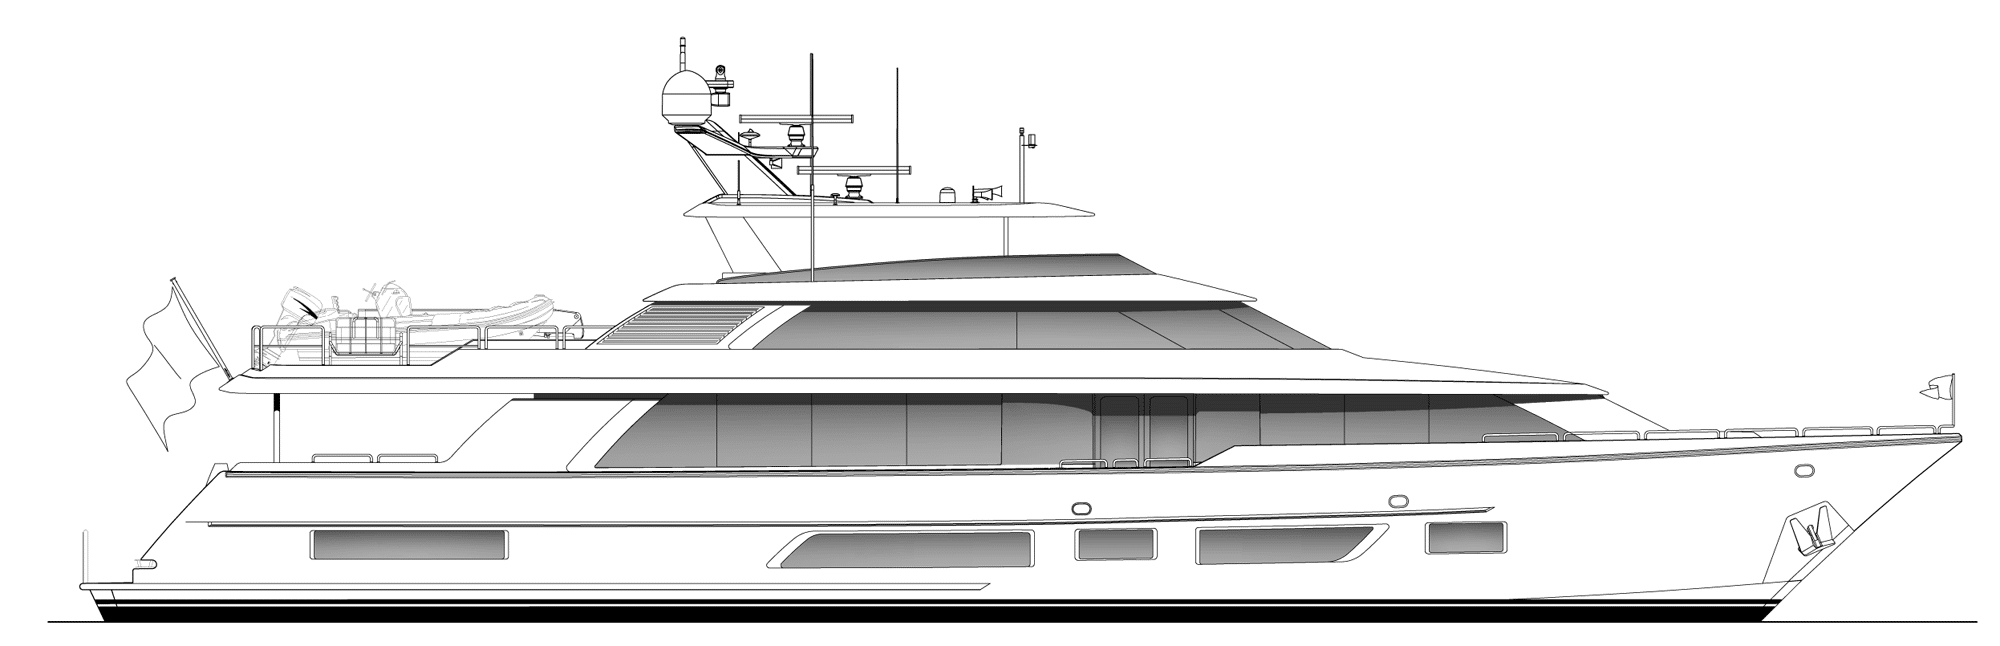 Westport W112   34M - Profile